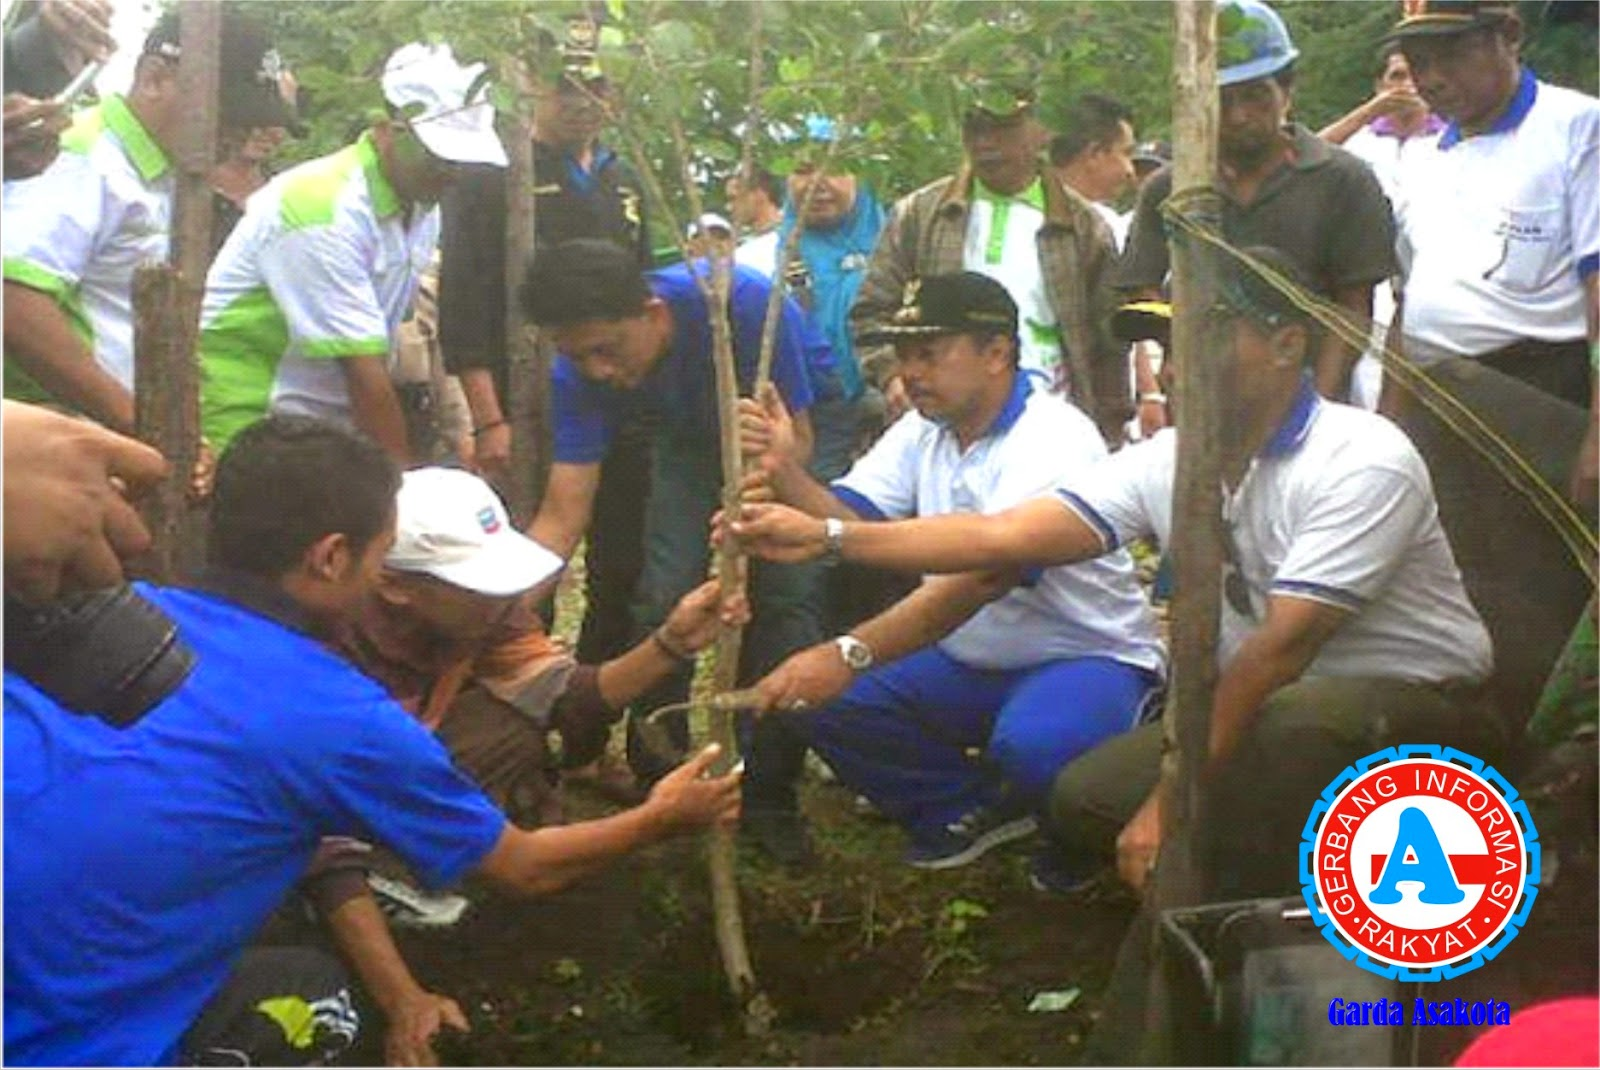 Walikota Tanam Pohon Bersama Jajaran Kantor Kecamatan Asakota